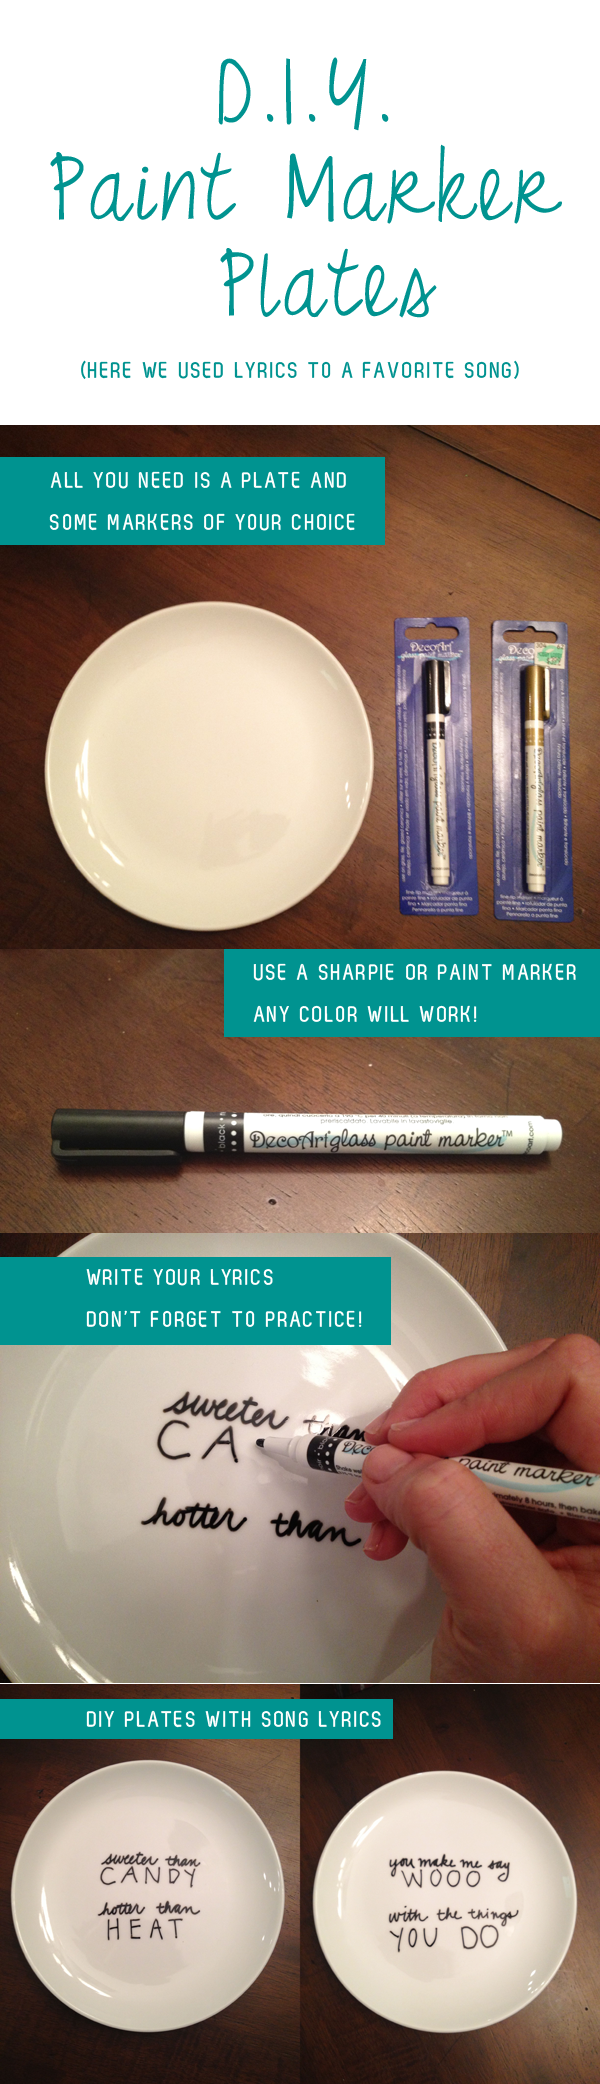 diy paint marker plates